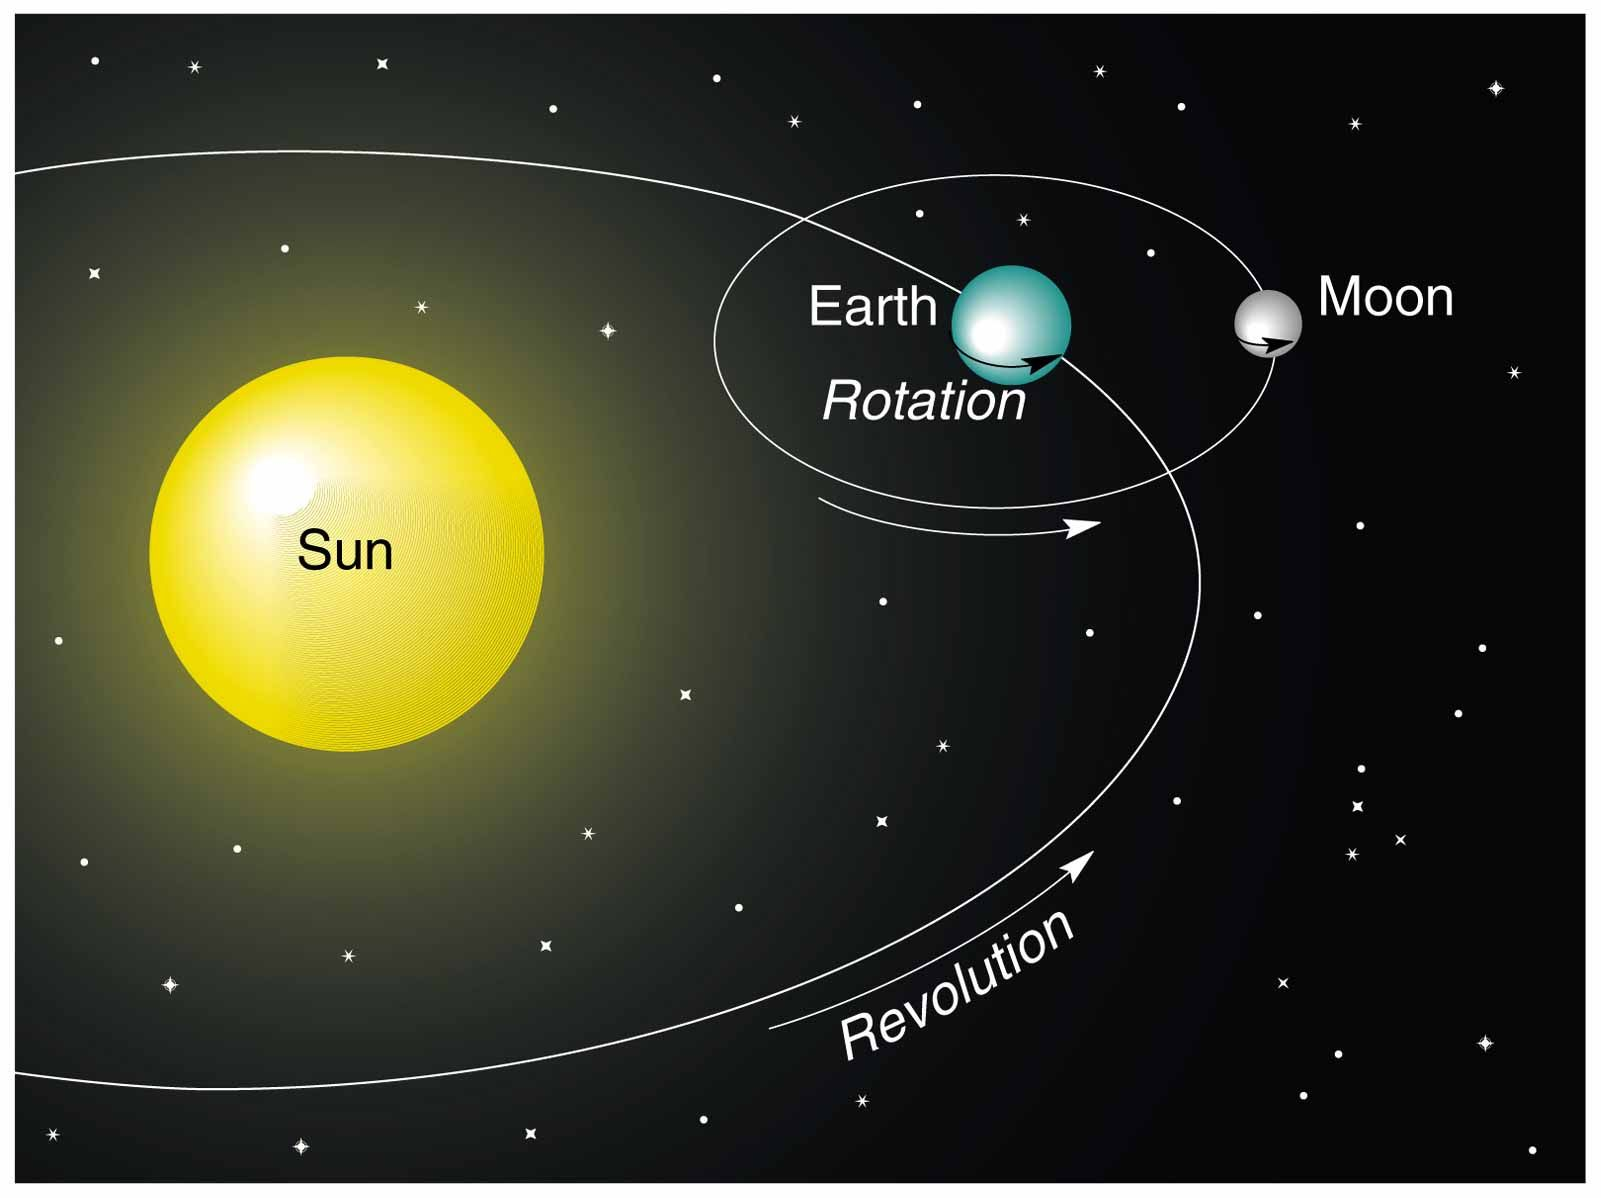 earth's rotation/revolution | science | Pinterest | Revolution and ...